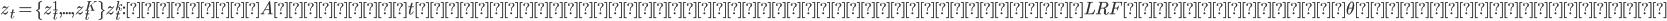 { \displaystyle z_t = \{z^1_t, ..., z^K_t\} z^k_t:センサAが時刻tにおいて計測した個々のデータ(LRFならば角度\thetaにおける距離) }